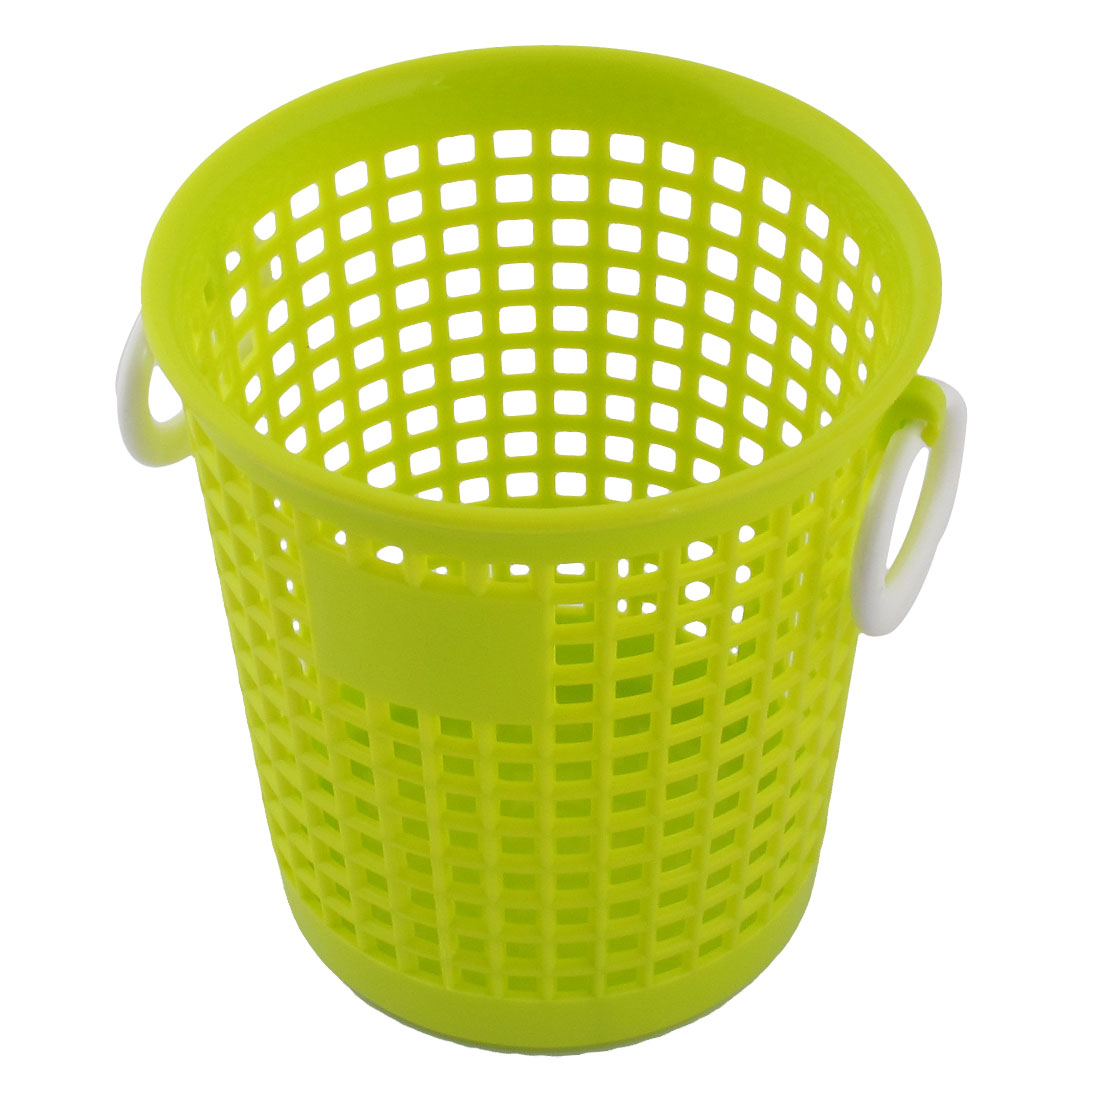 Household Plastic Cylindrical Shape Storage Sundries Organizer Basket Box Yellow Green